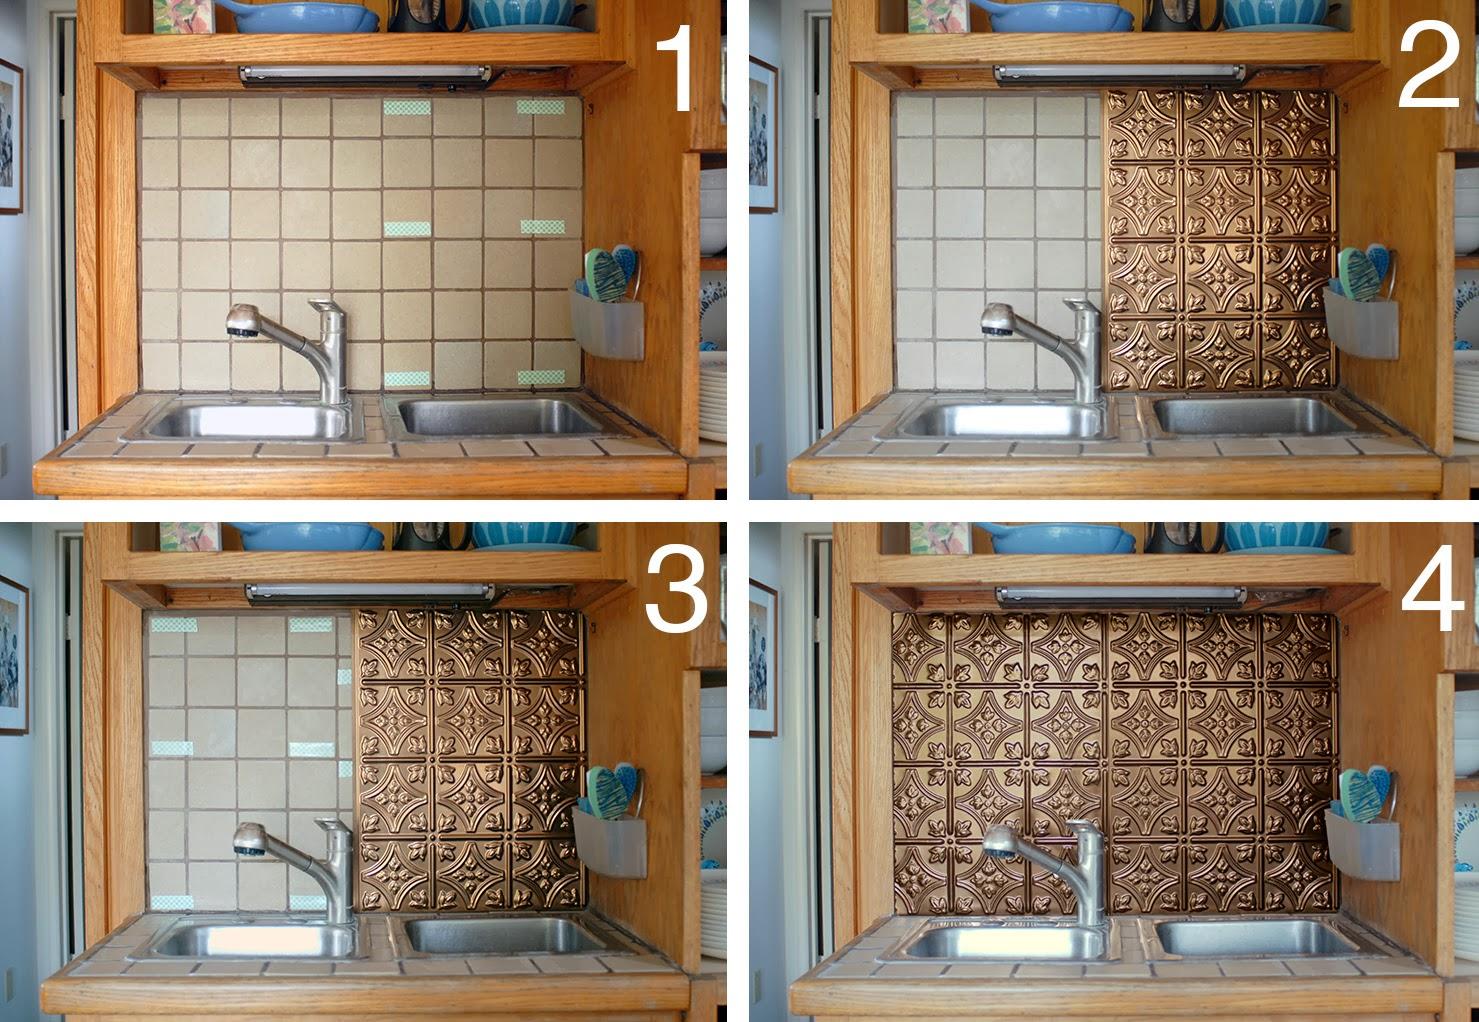 Inexpensive Backsplash Ideas kitchen backsplash